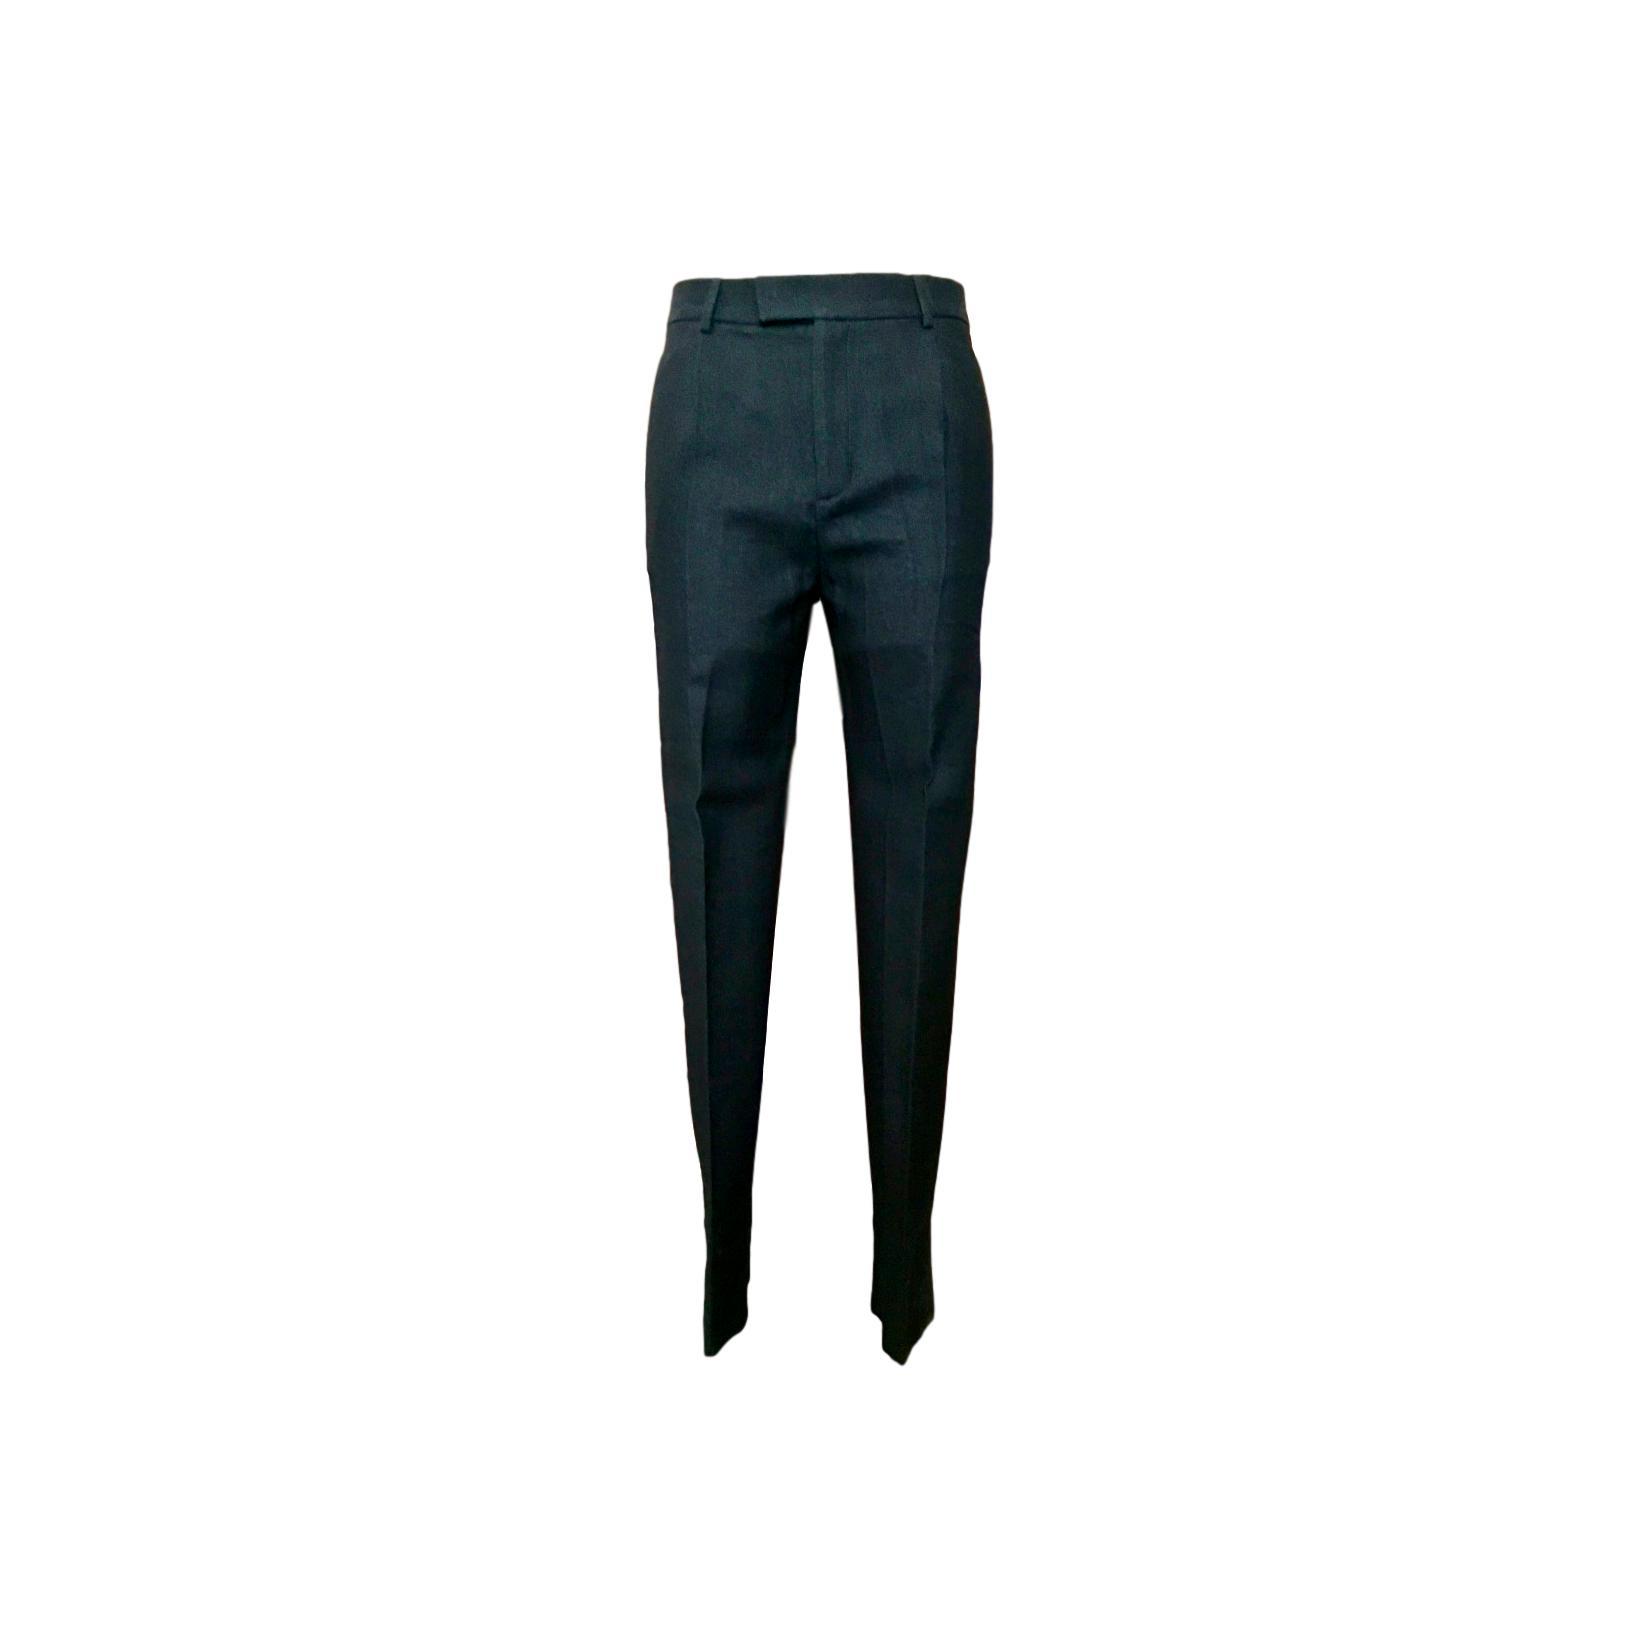 0c47213c8d3 Купить брюки McQ by Alexander McQueen за 13100 руб. в интернет ...